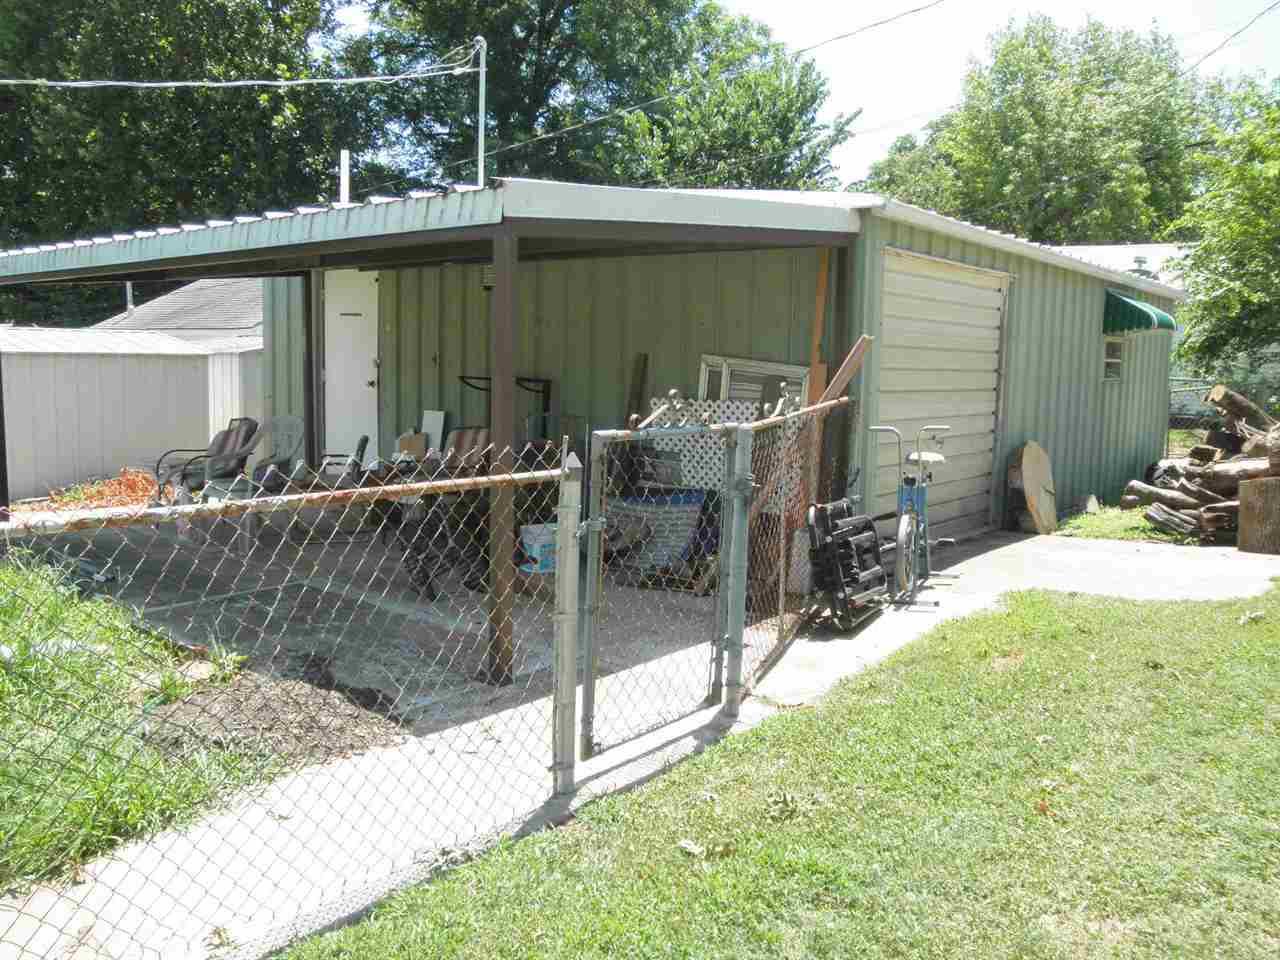 #century21groupone, #homesforsaleponcacity, #poncacityrealestate | 806 N Ash  Ponca City, OK  3